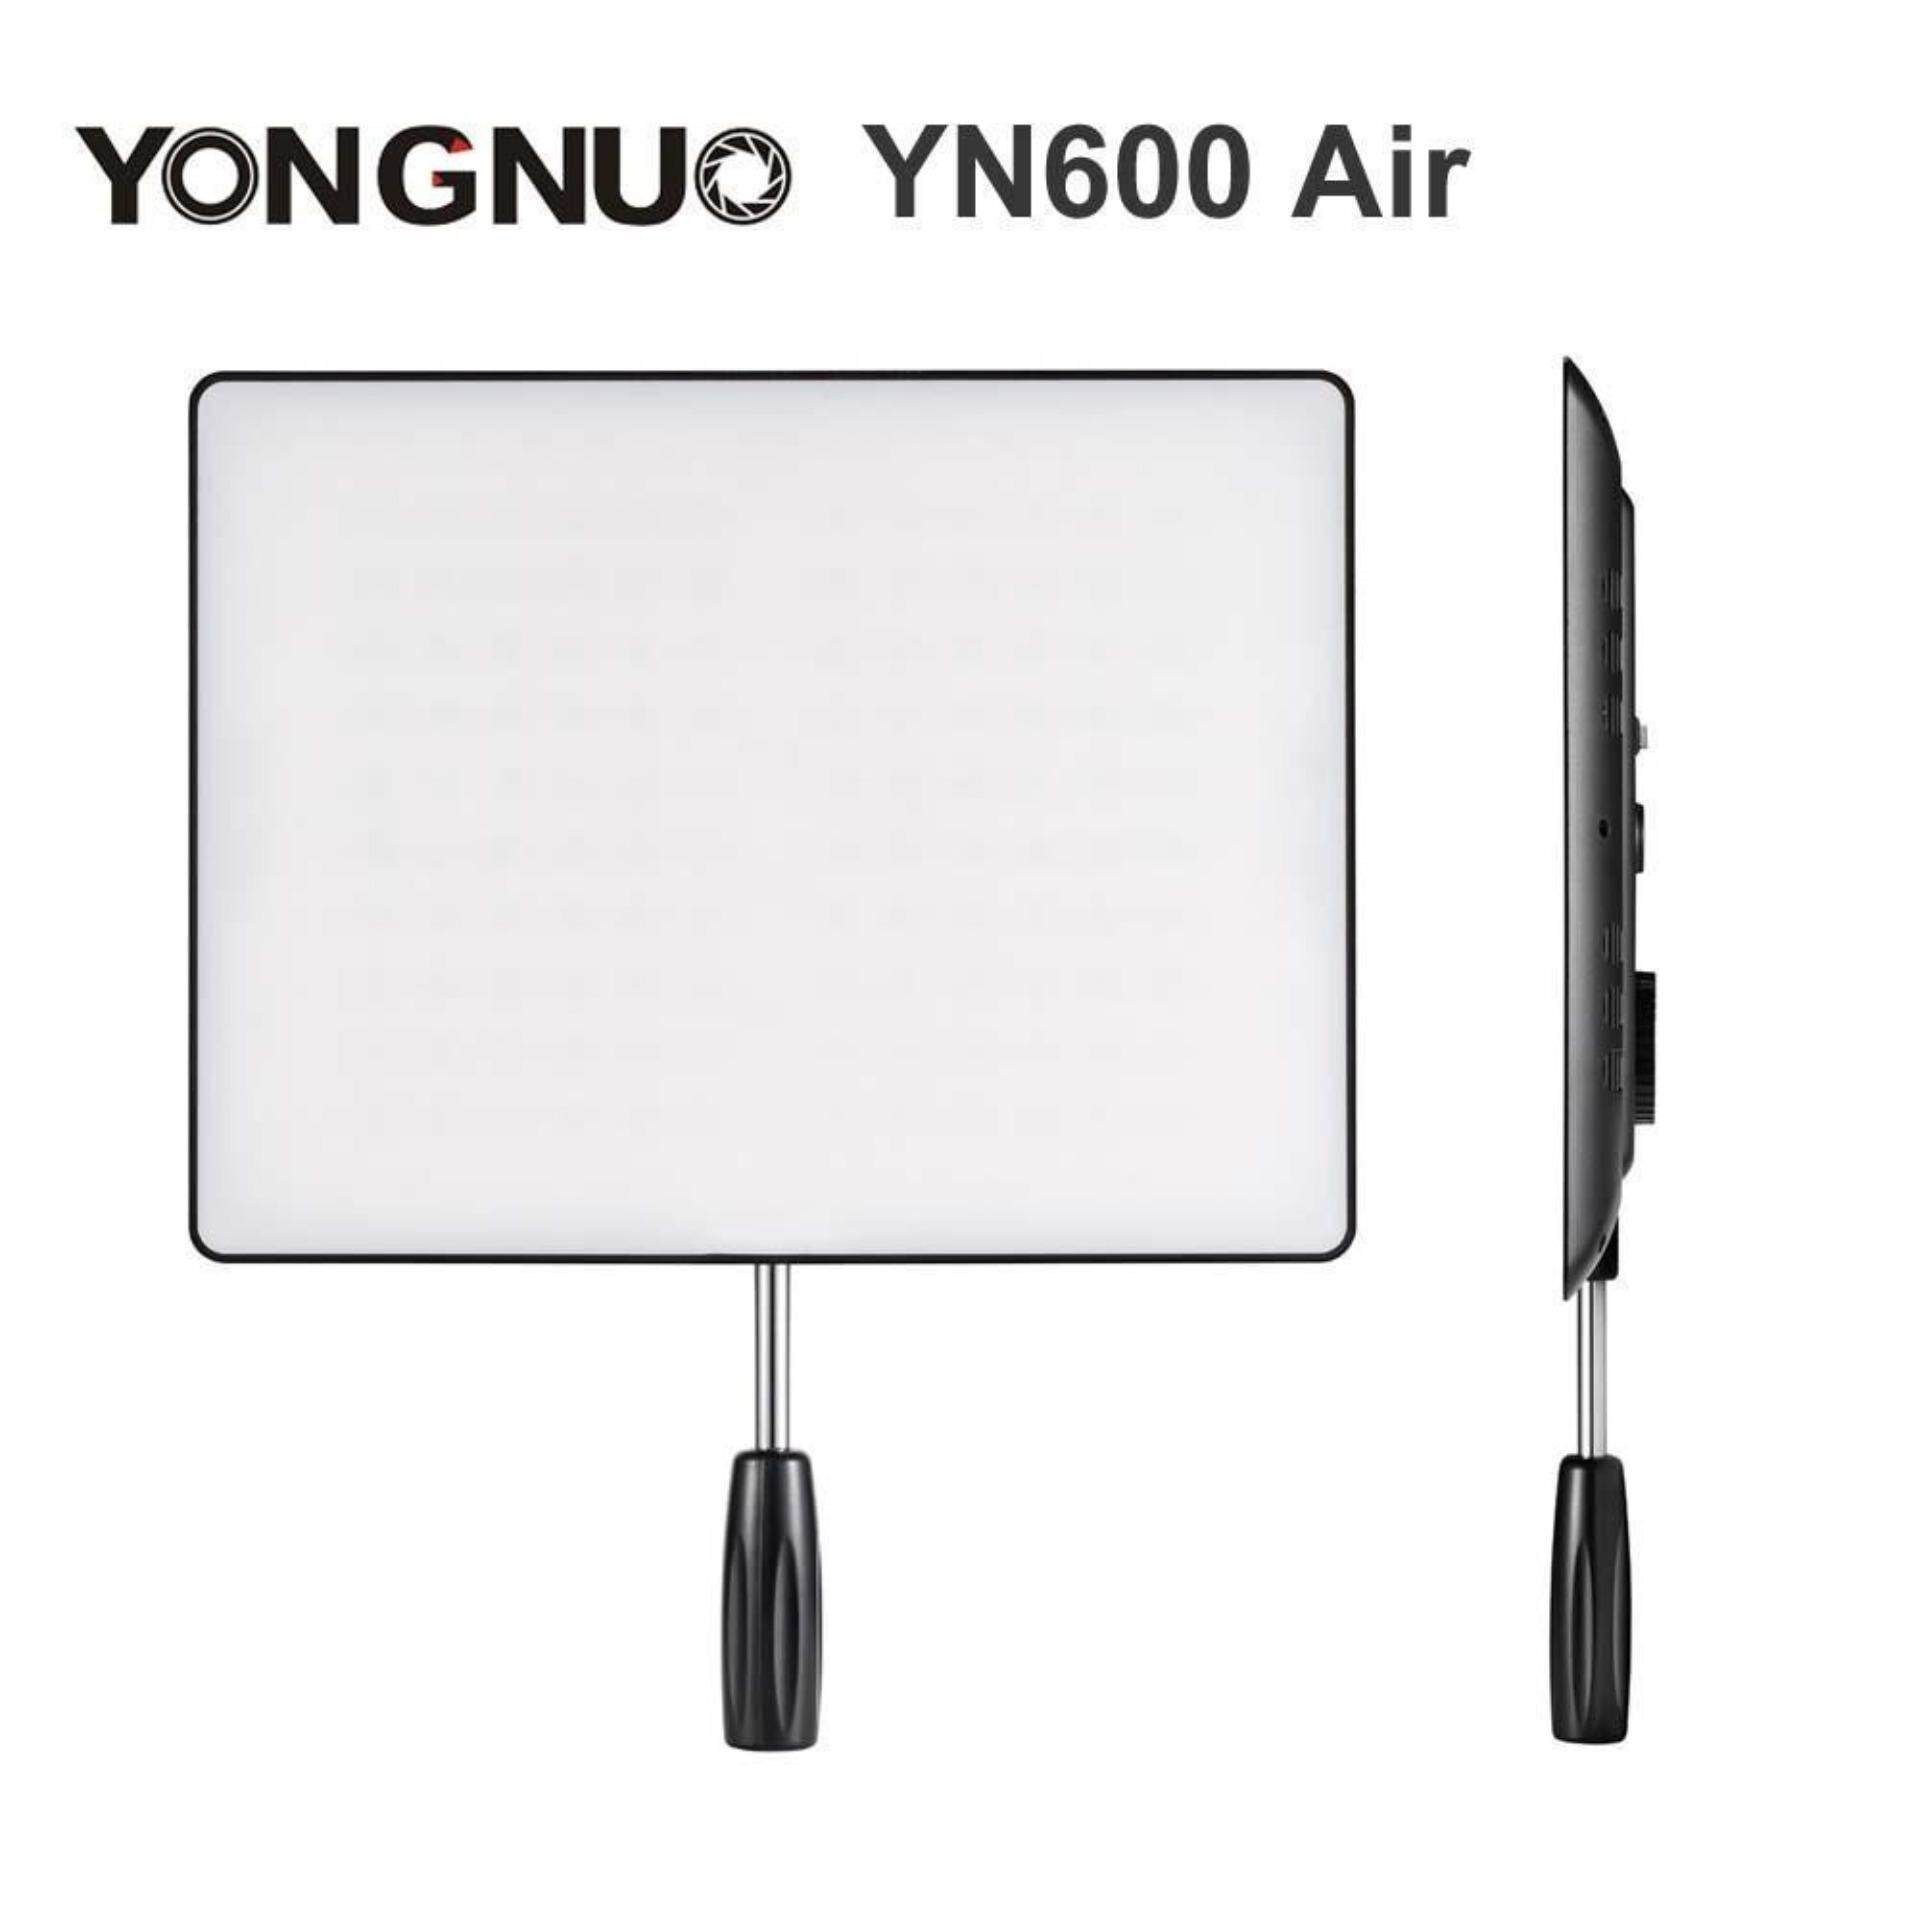 Yongnuo Yn600 Air Ultra Thin Led Camera Video Light Panel 3200K 5500K Bi Color P Intl Price Comparison